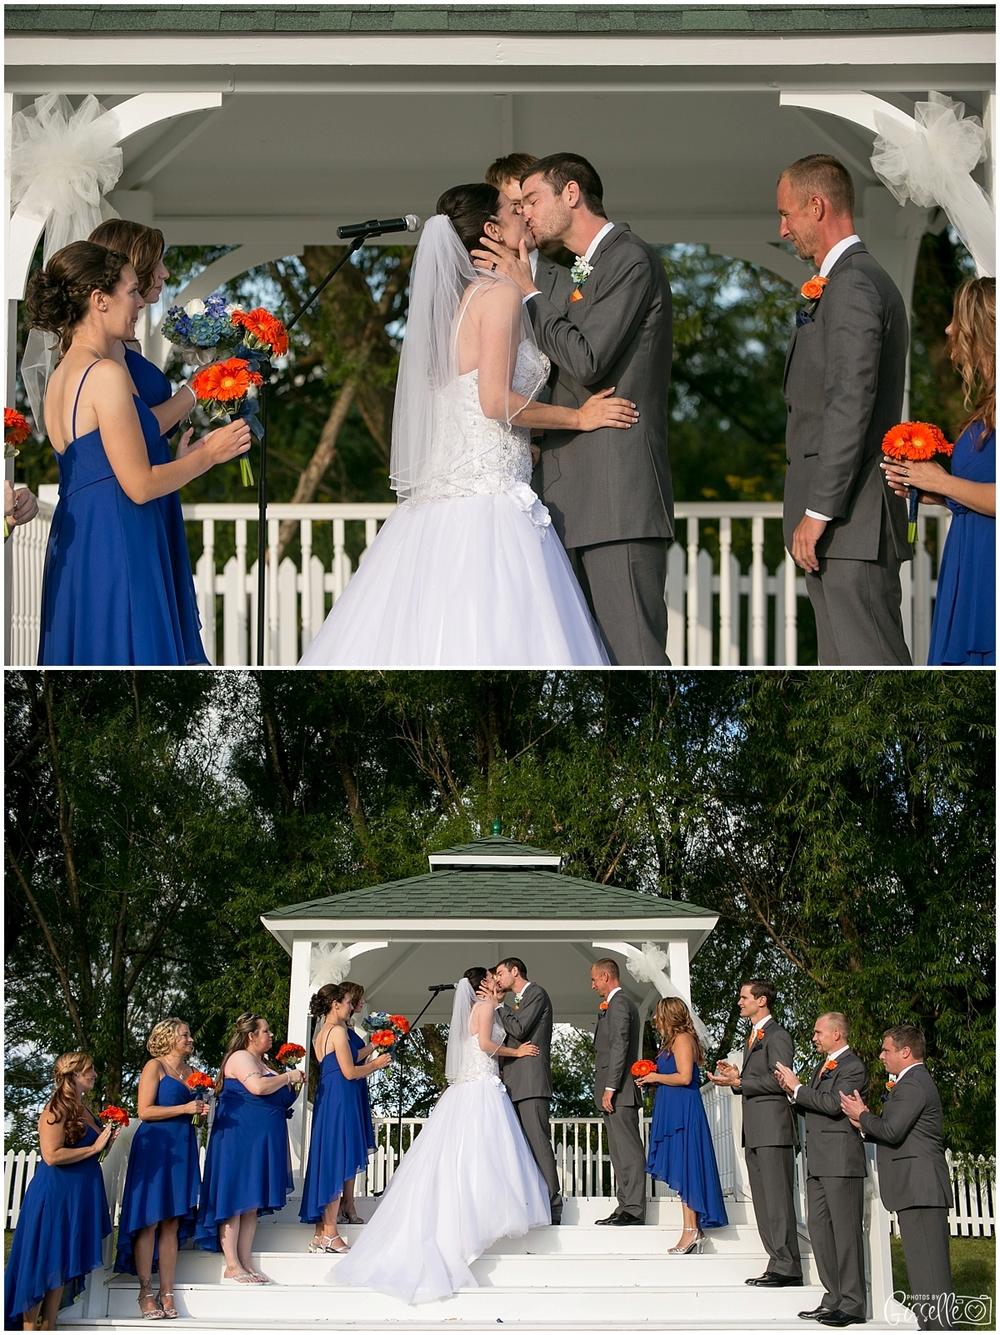 Fox-Valley-Country-Club-Wedding_0008.jpg